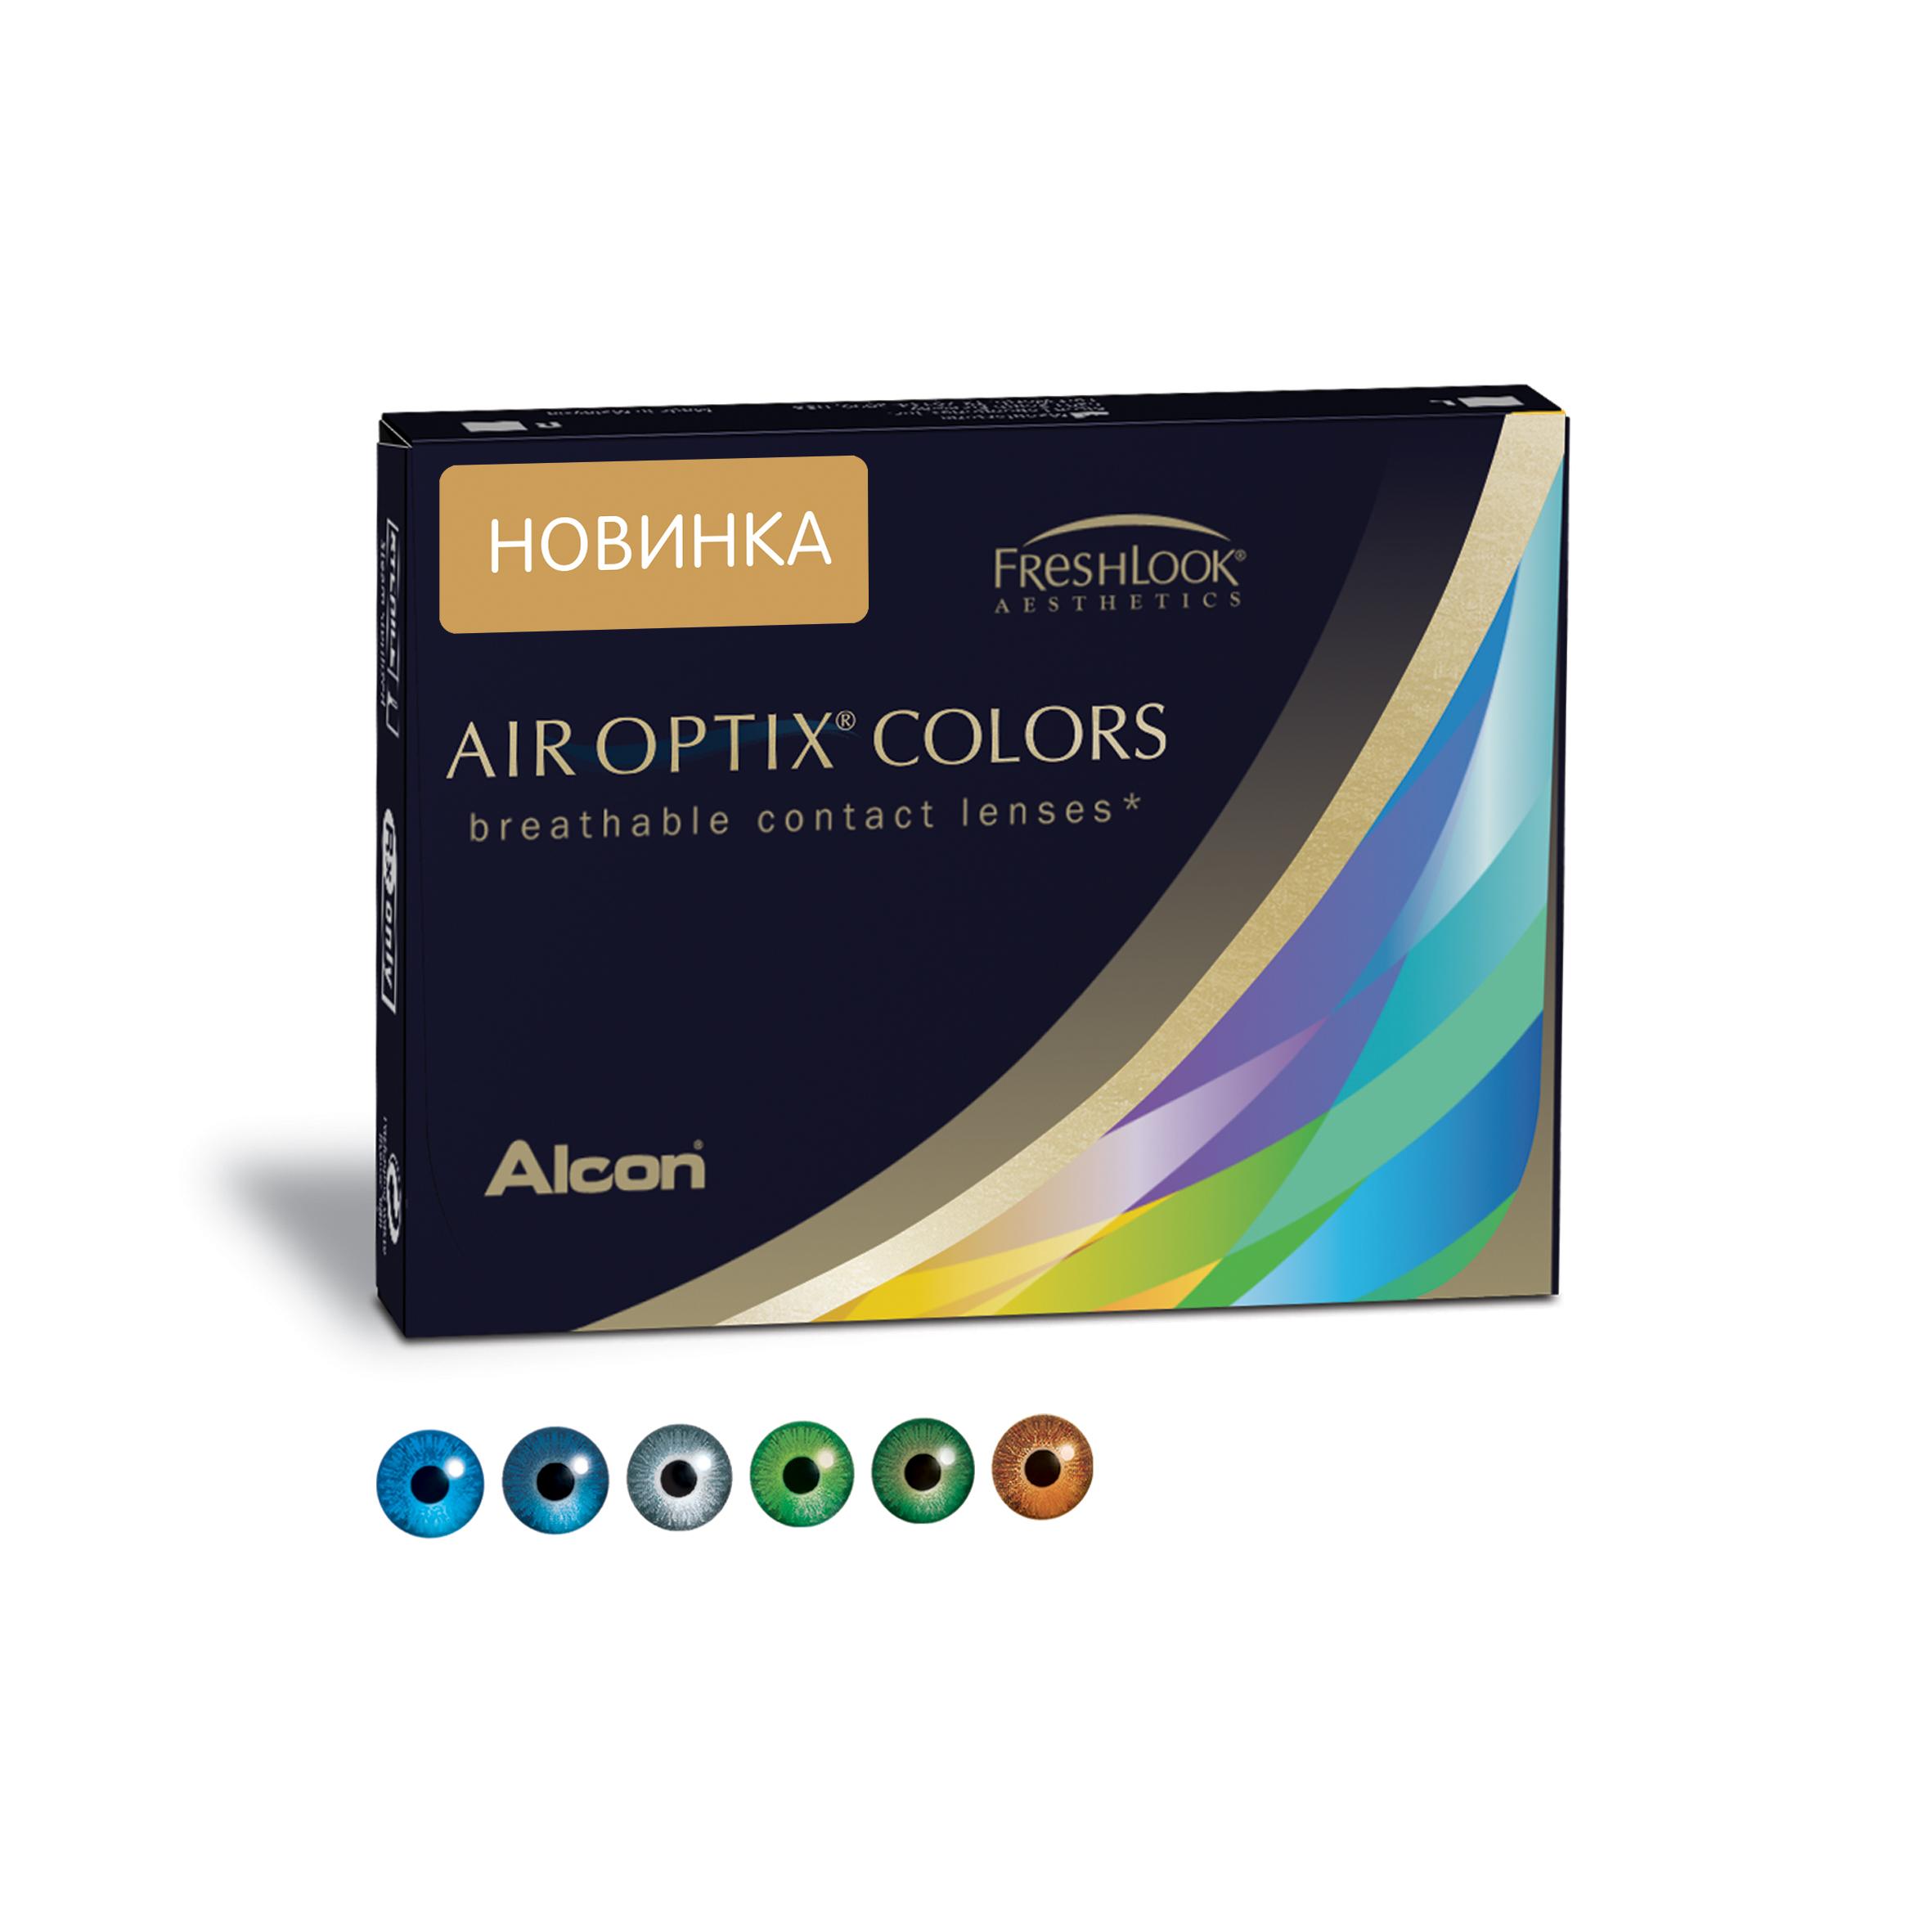 Аlcon контактные линзы Air Optix Colors 2 шт -1.00 Brilliant Blue31746122Мягкие контактные линзы